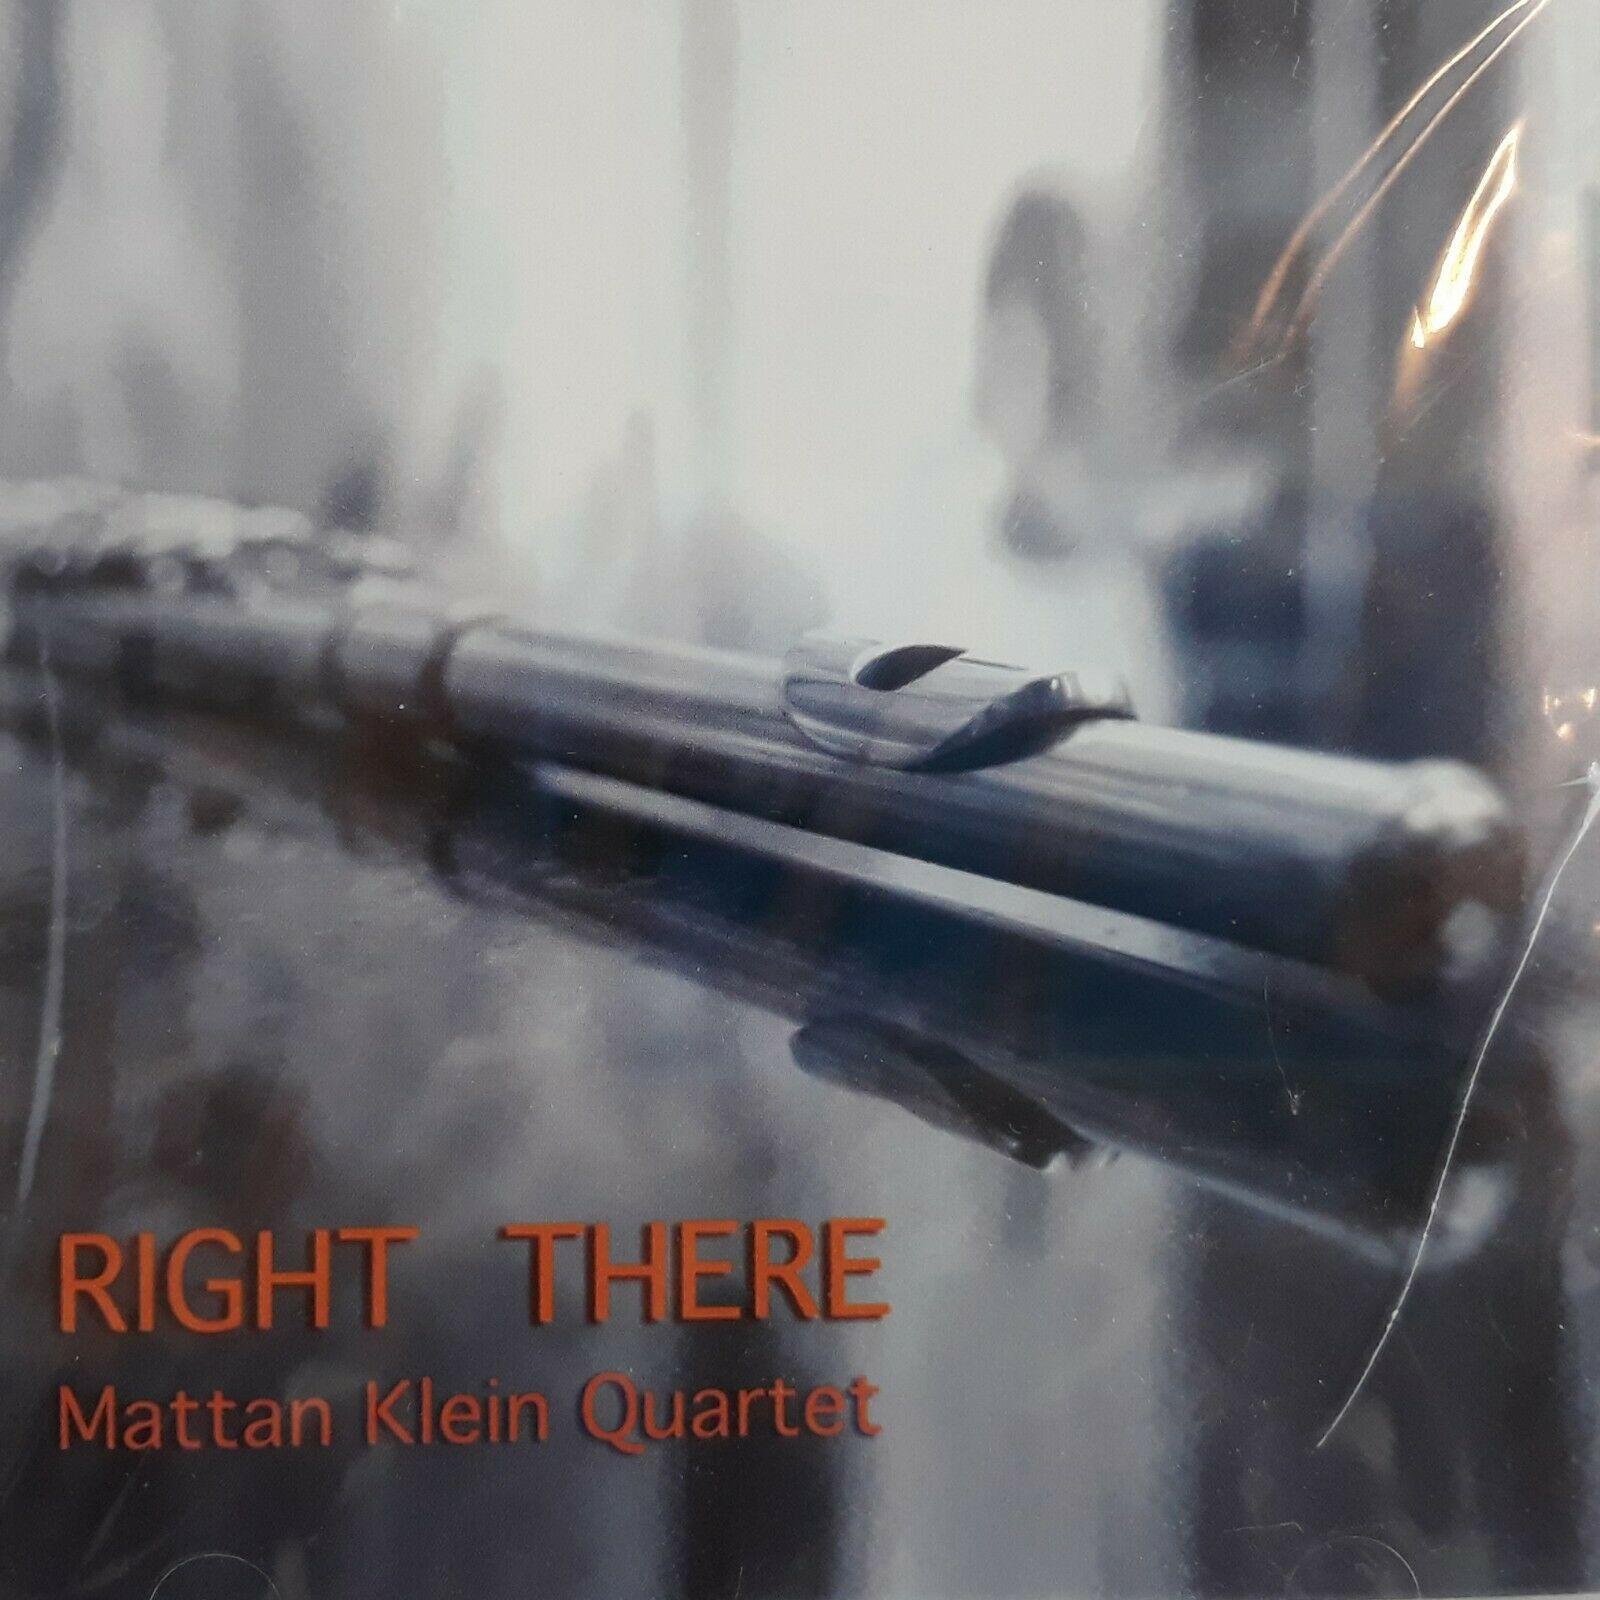 Mattan Klein Quartet - Right There (1999) [FLAC] Download